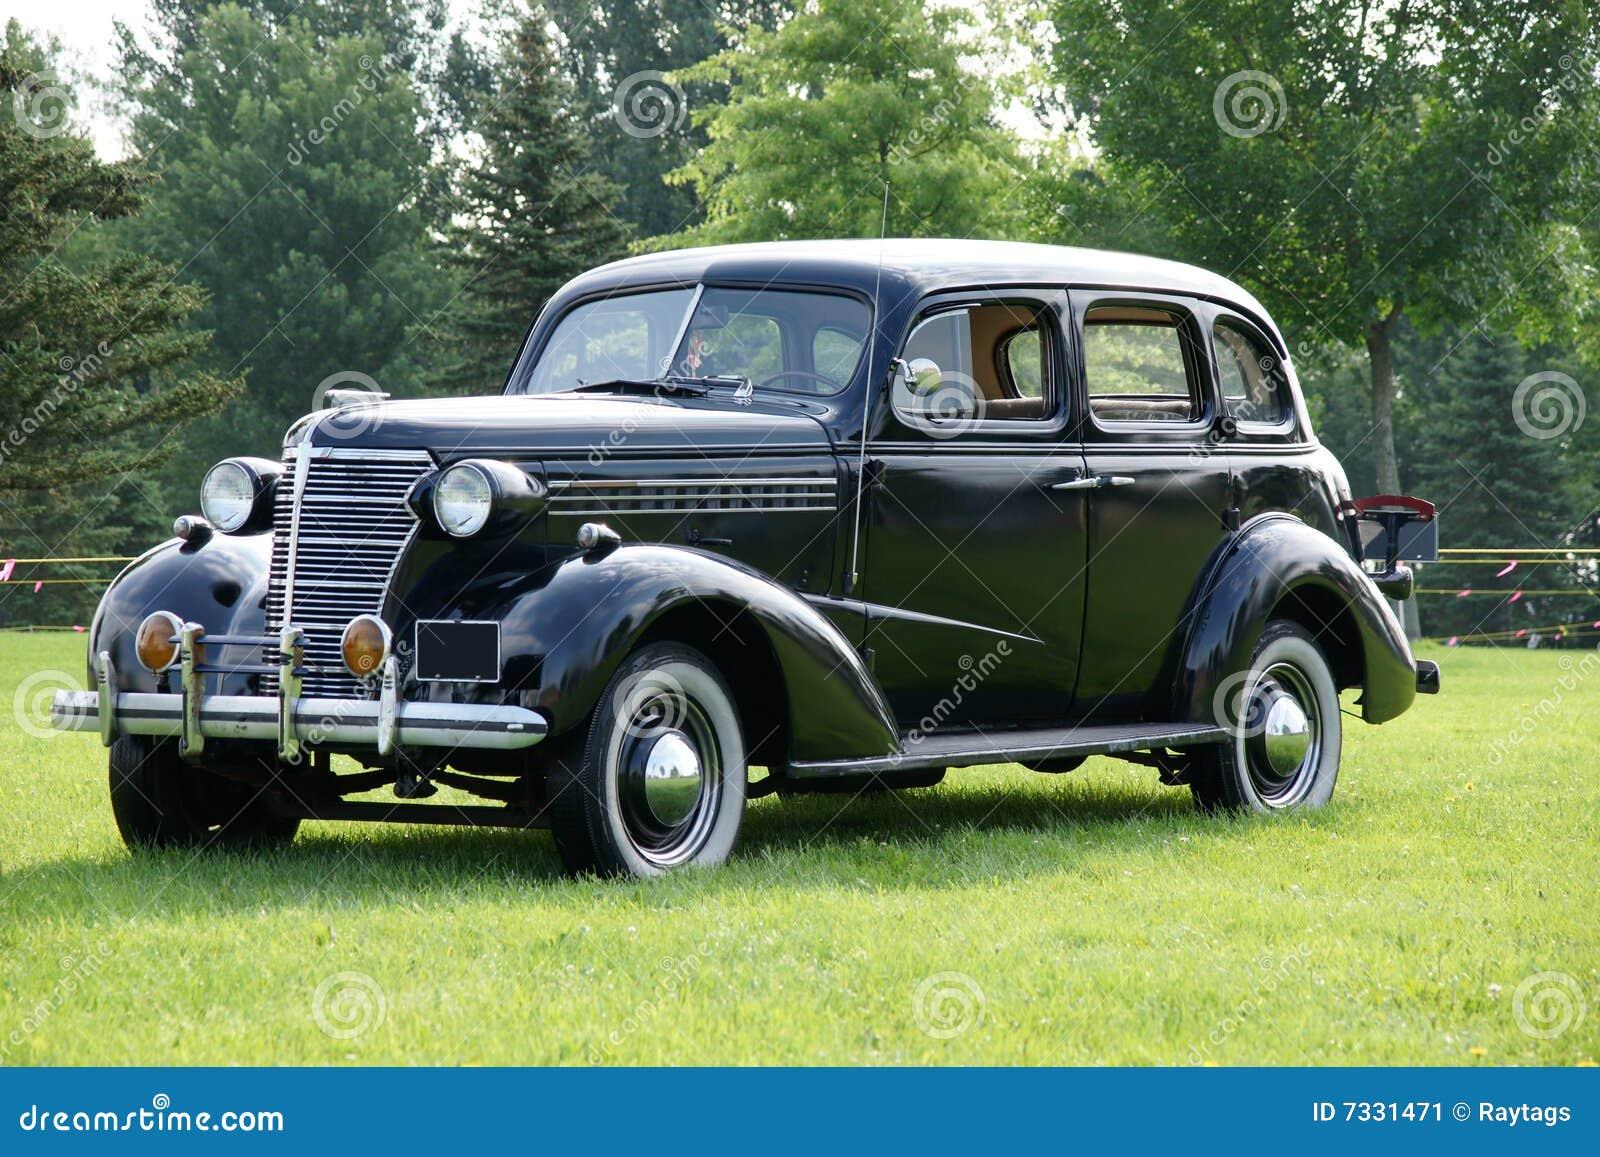 1938 chevrolet stock image image 7331471 for 1938 chevy 4 door